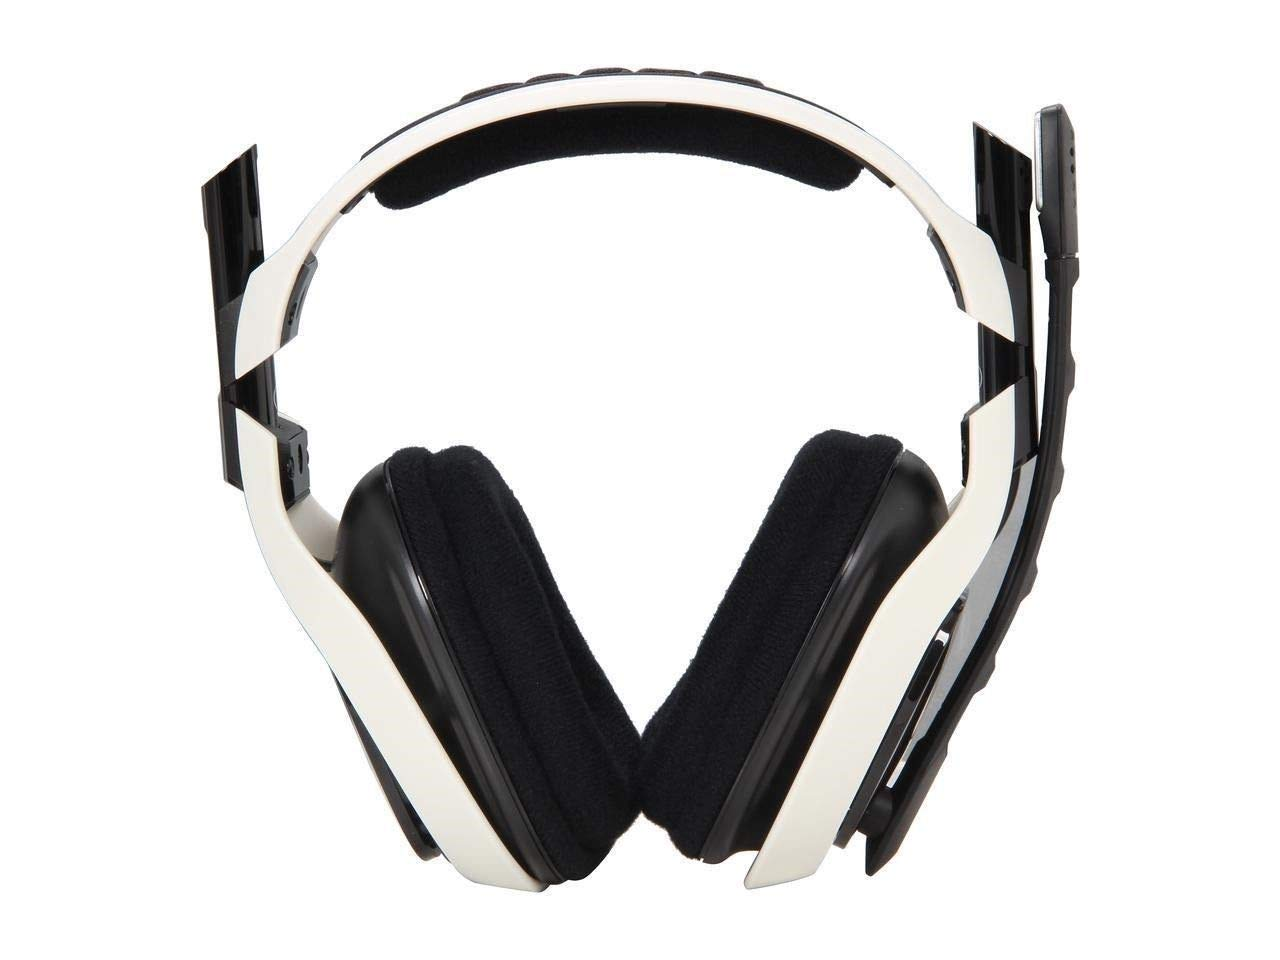 Amazon com: ASTRO Gaming A40 PC Barebone Headset Only, No